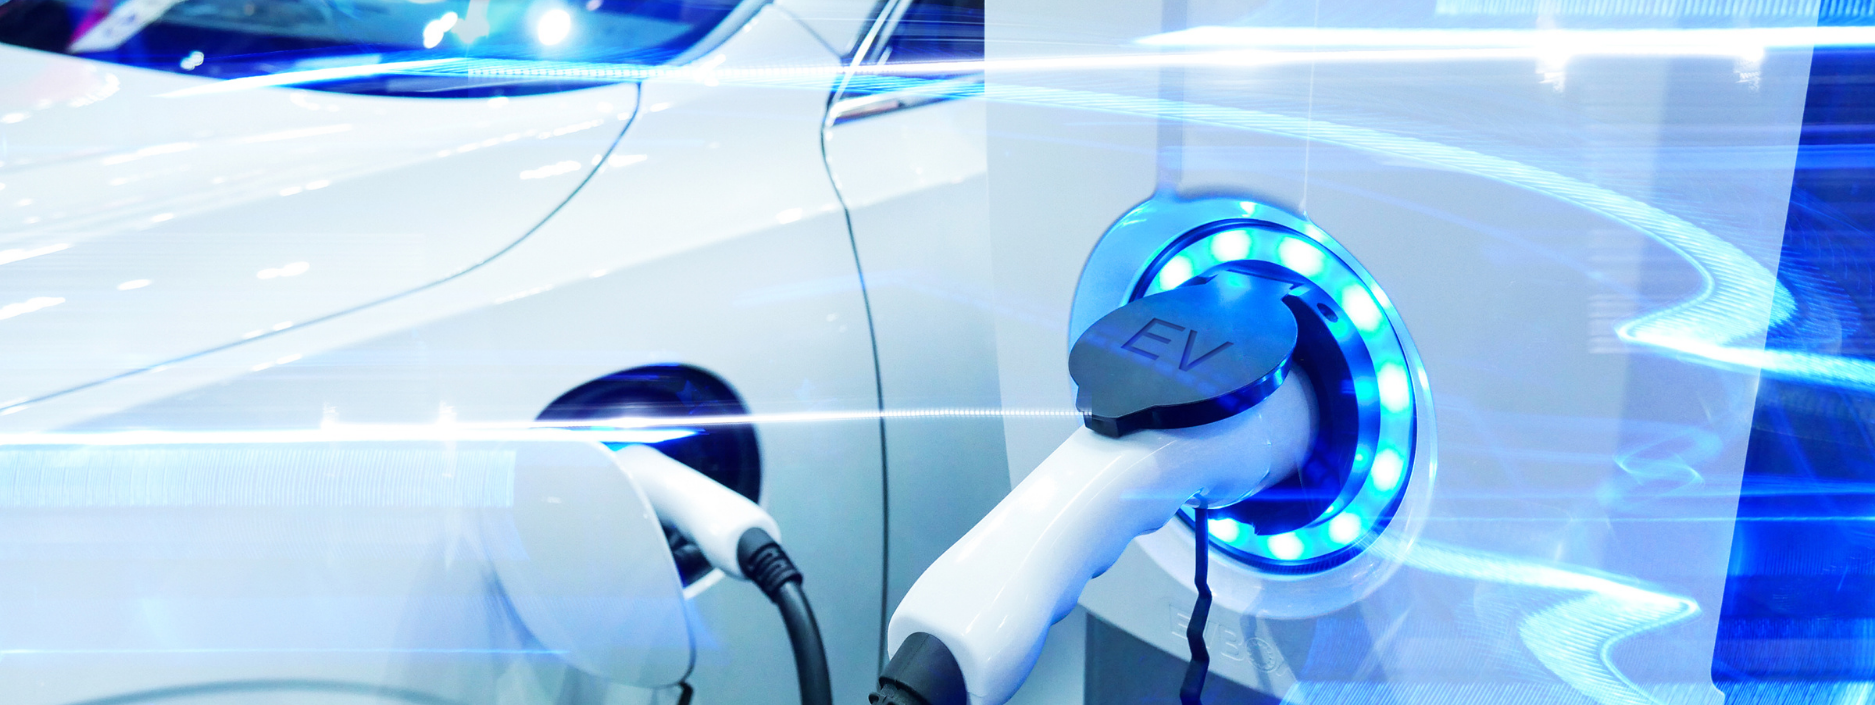 Electric vehicle rays